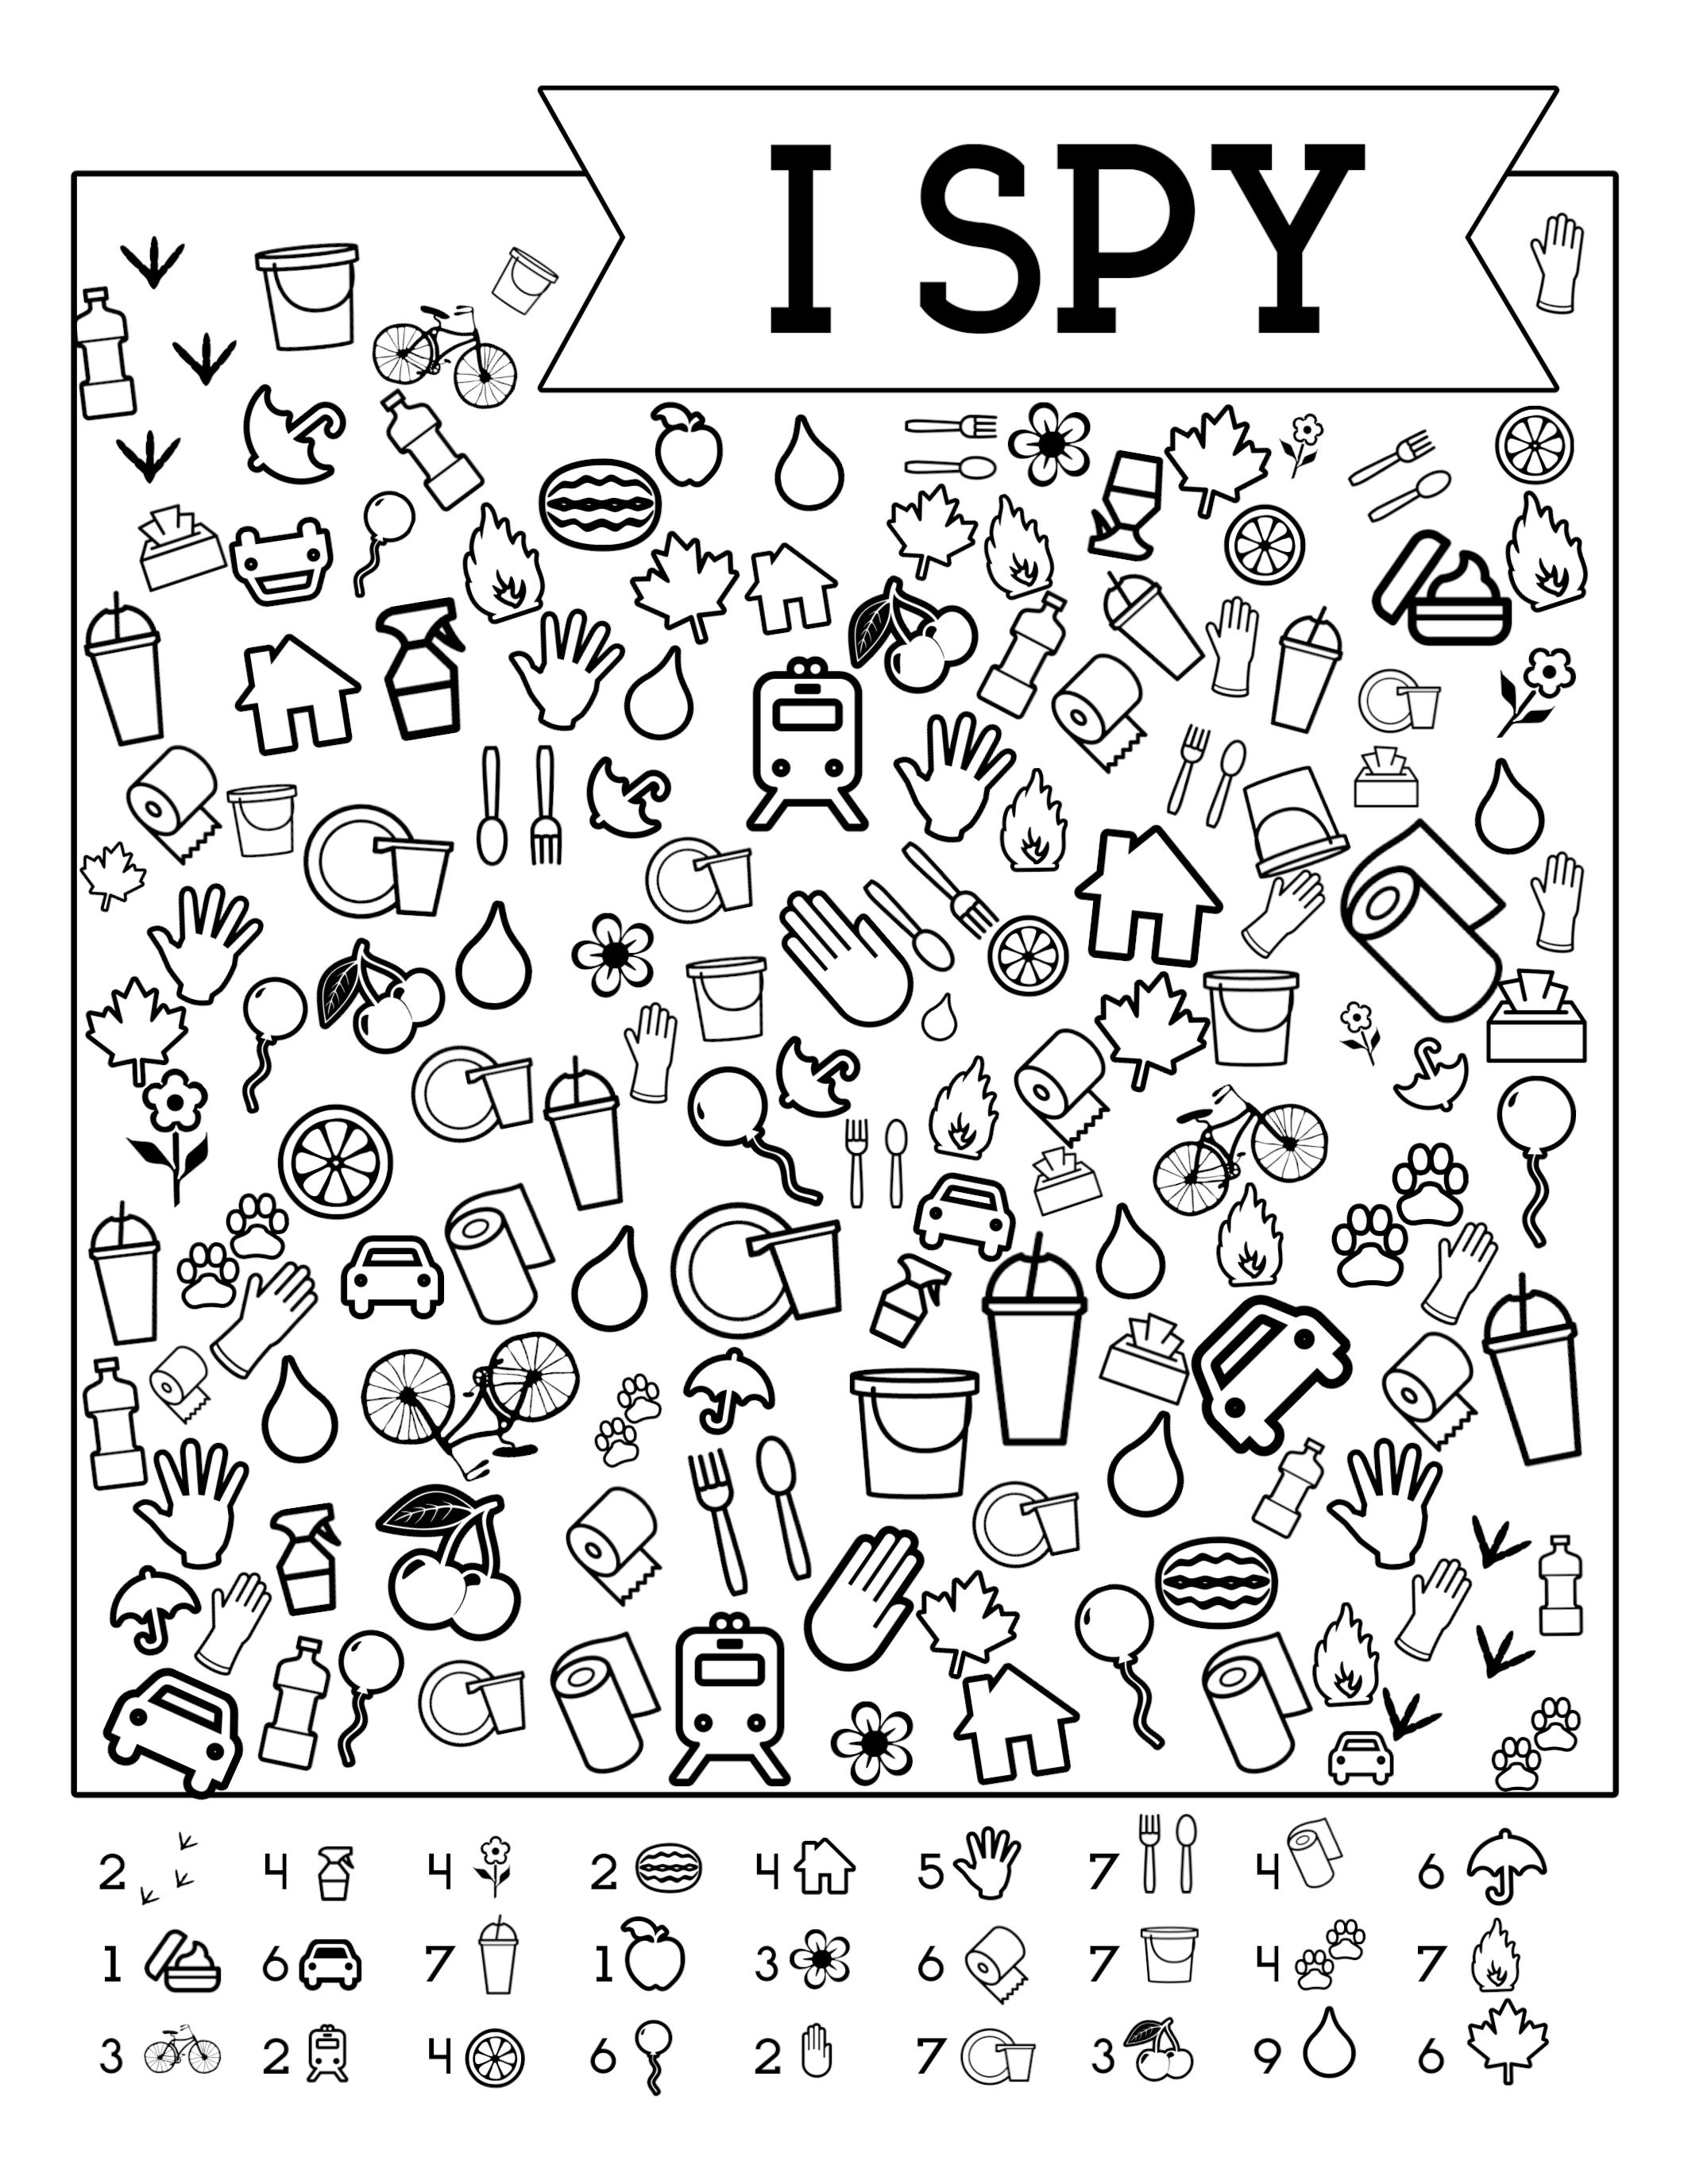 I-Spy-Free-Printable-Kids-Game | Spy School Camp | Road Trip Games - I Spy Puzzles Printable